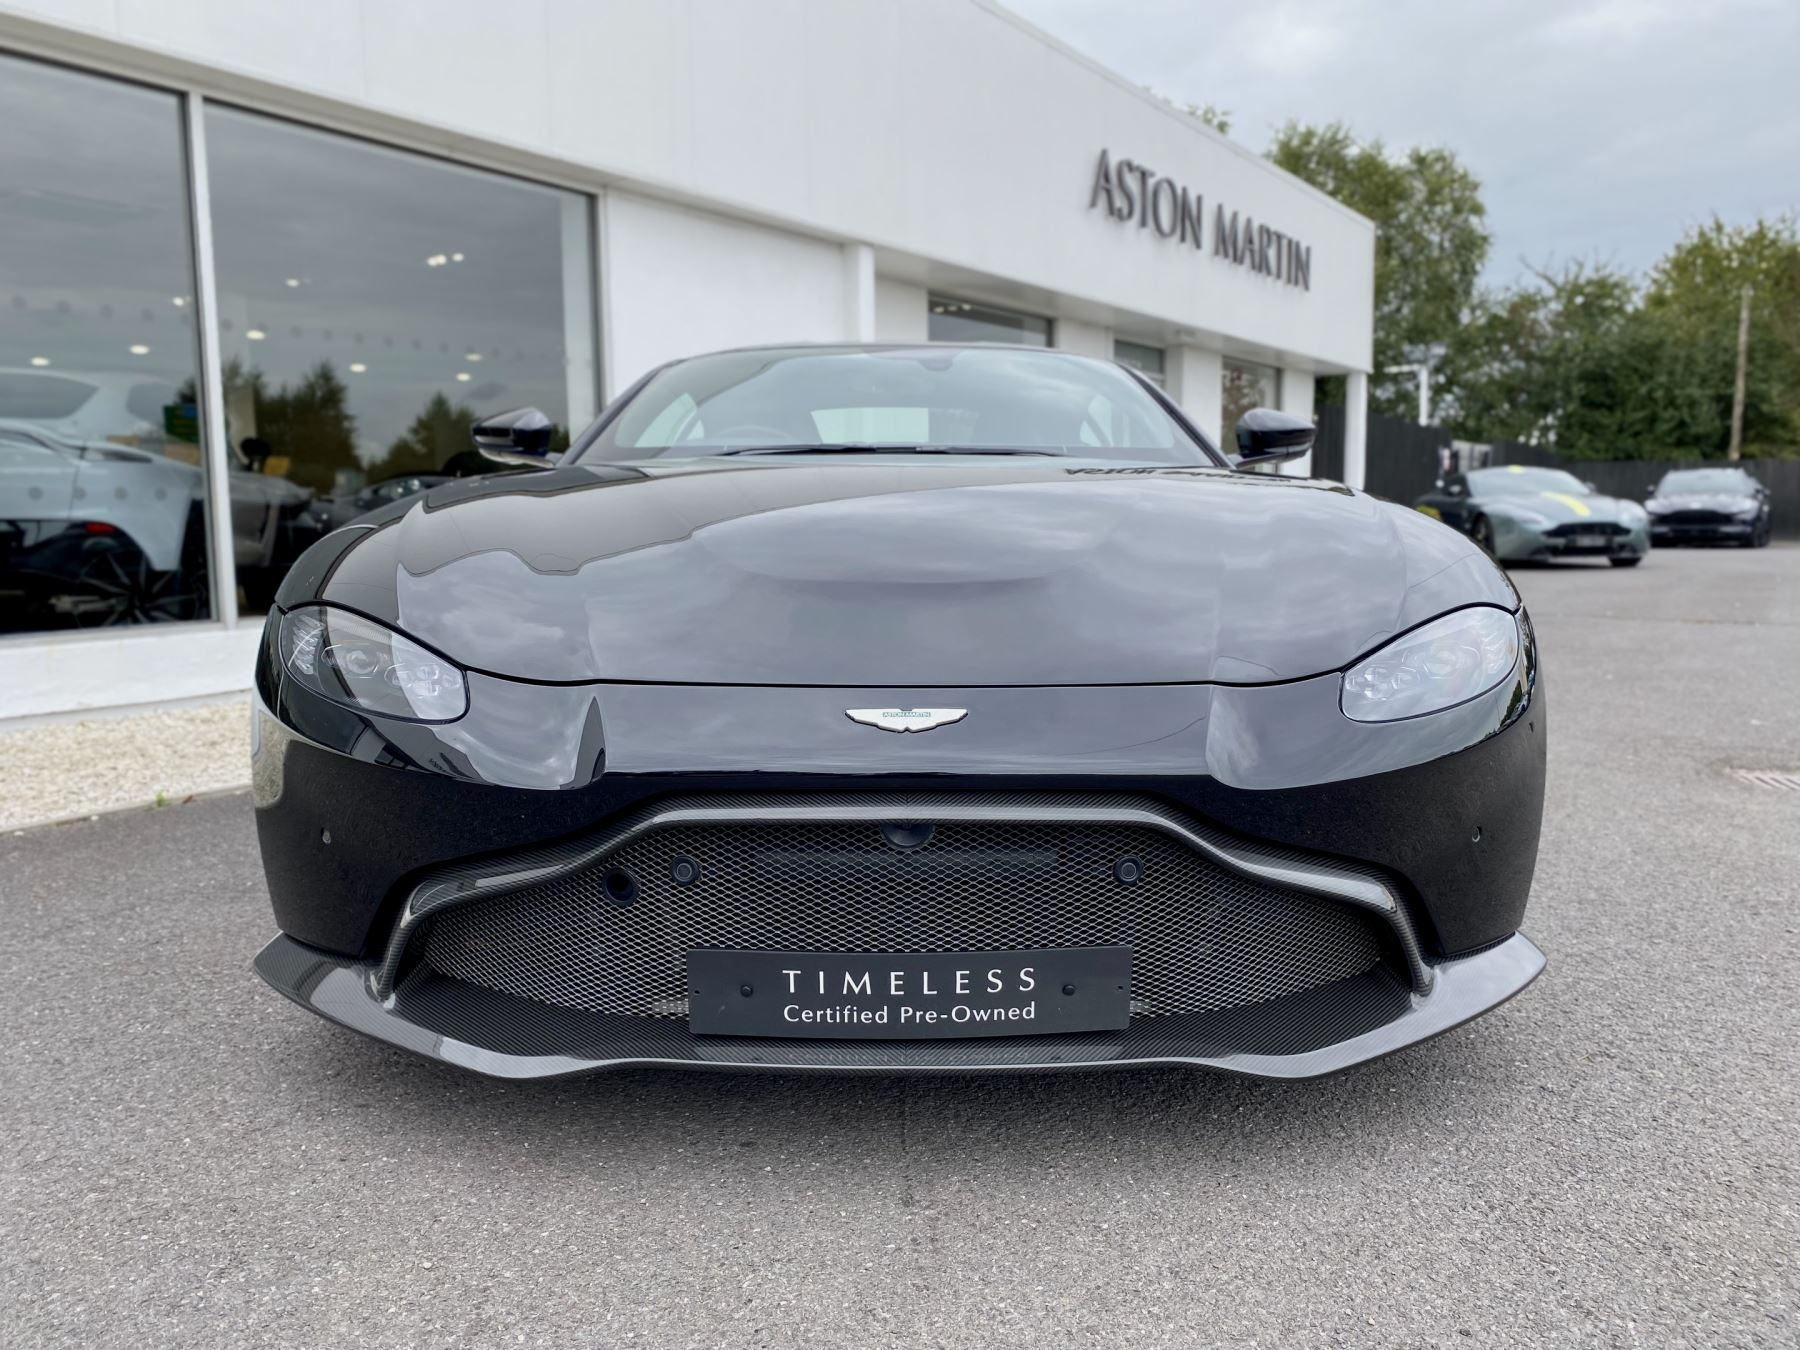 Aston Martin New Vantage 2dr ZF 8 Speed Auto. 4.0 Twin Turbo ZF Gearbox  Reversing Camera Heated Seats Ceramic Brakes image 2